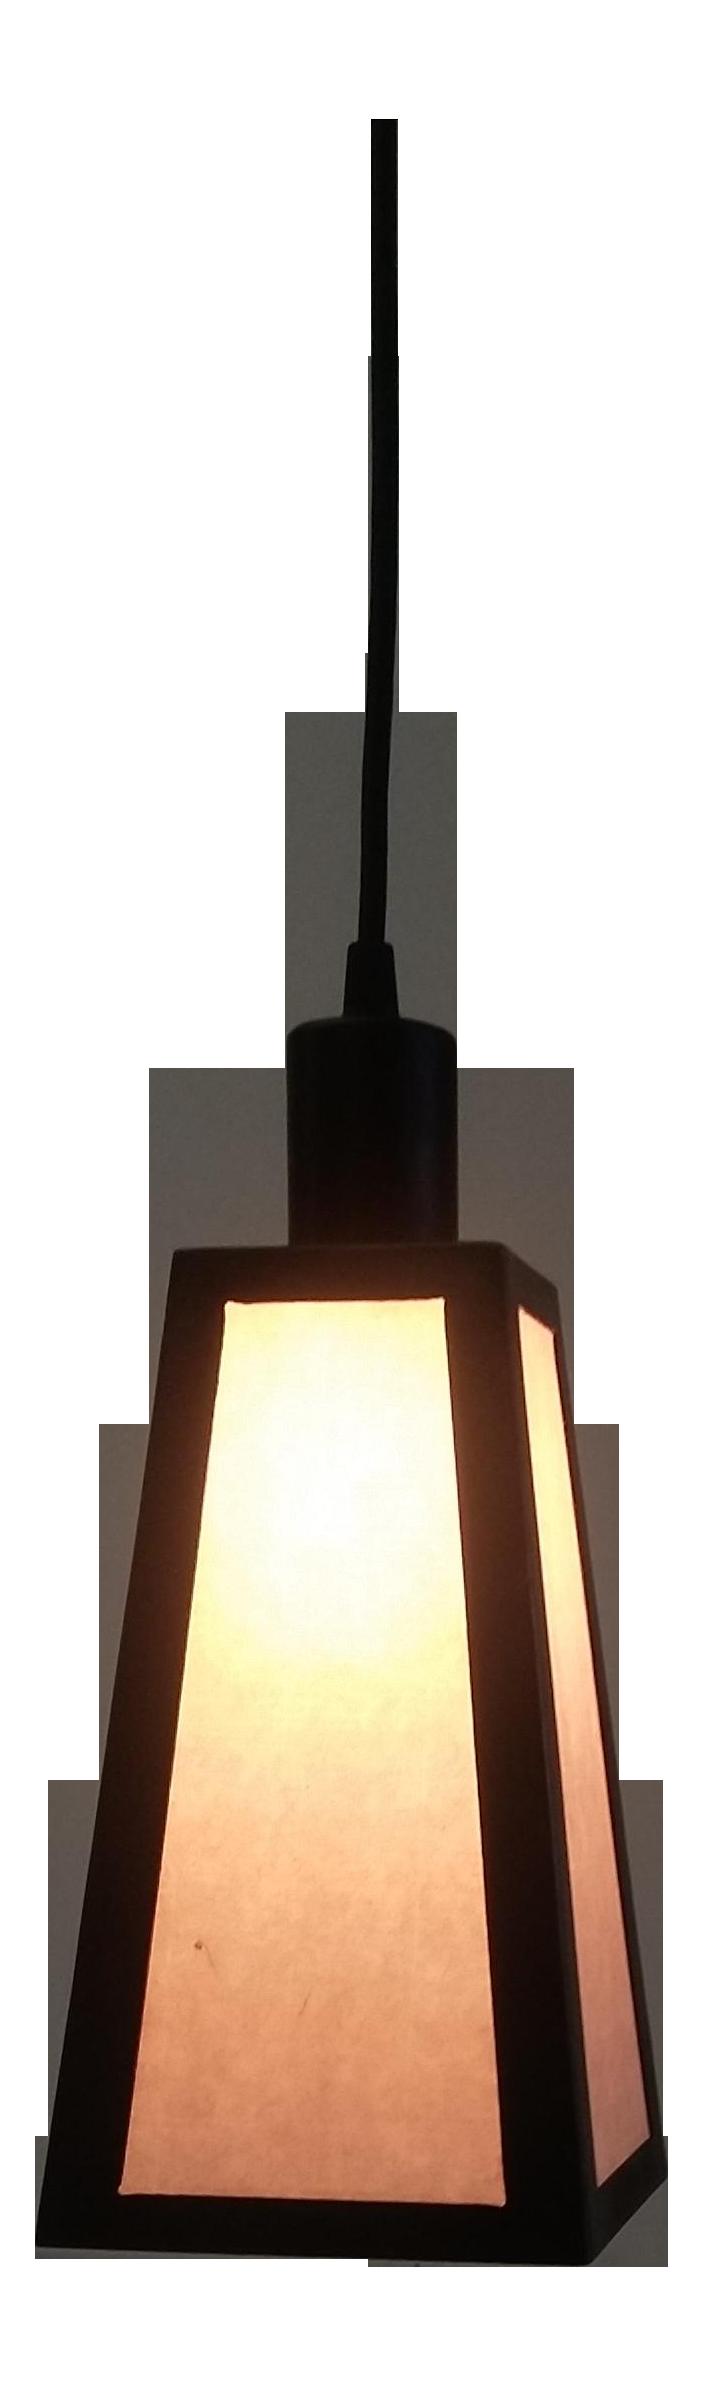 asian pendant lighting. nara pendant light asian lighting